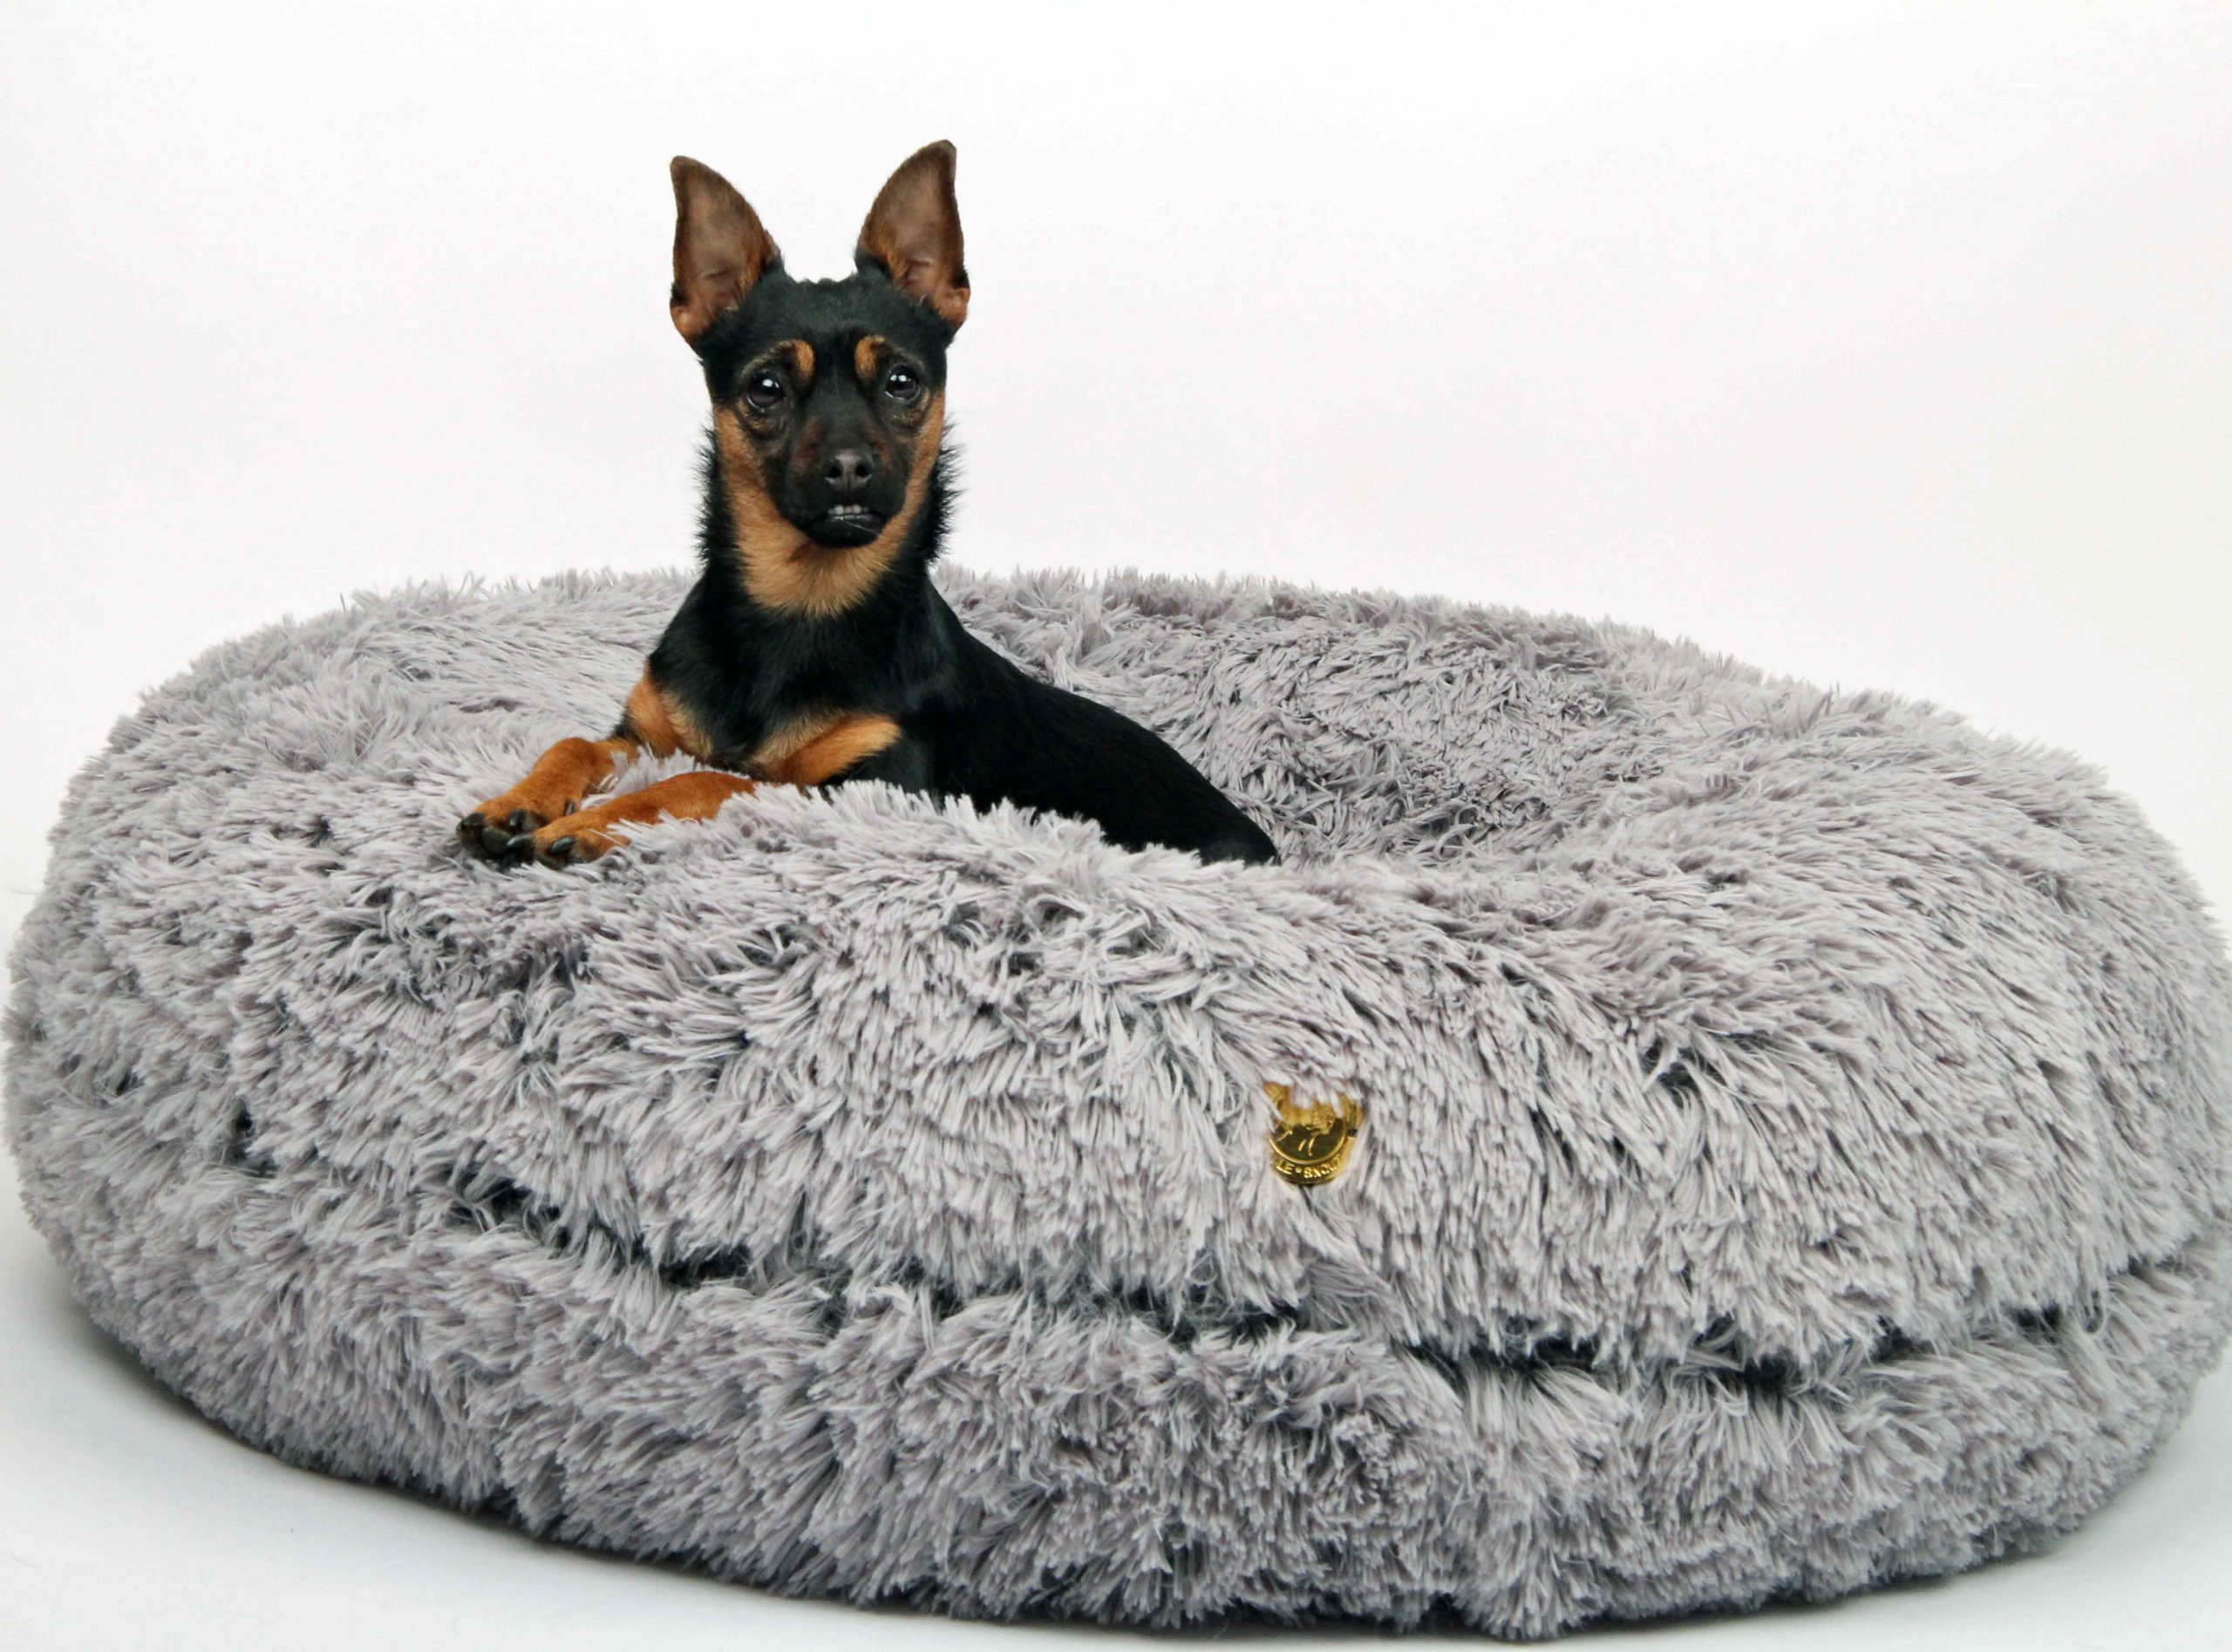 Full Size of Hundebett Flocke 120 Cm Kaufen 125 Zooplus Xxl Bitiba 90 Wolke Wohnzimmer Hundebett Flocke